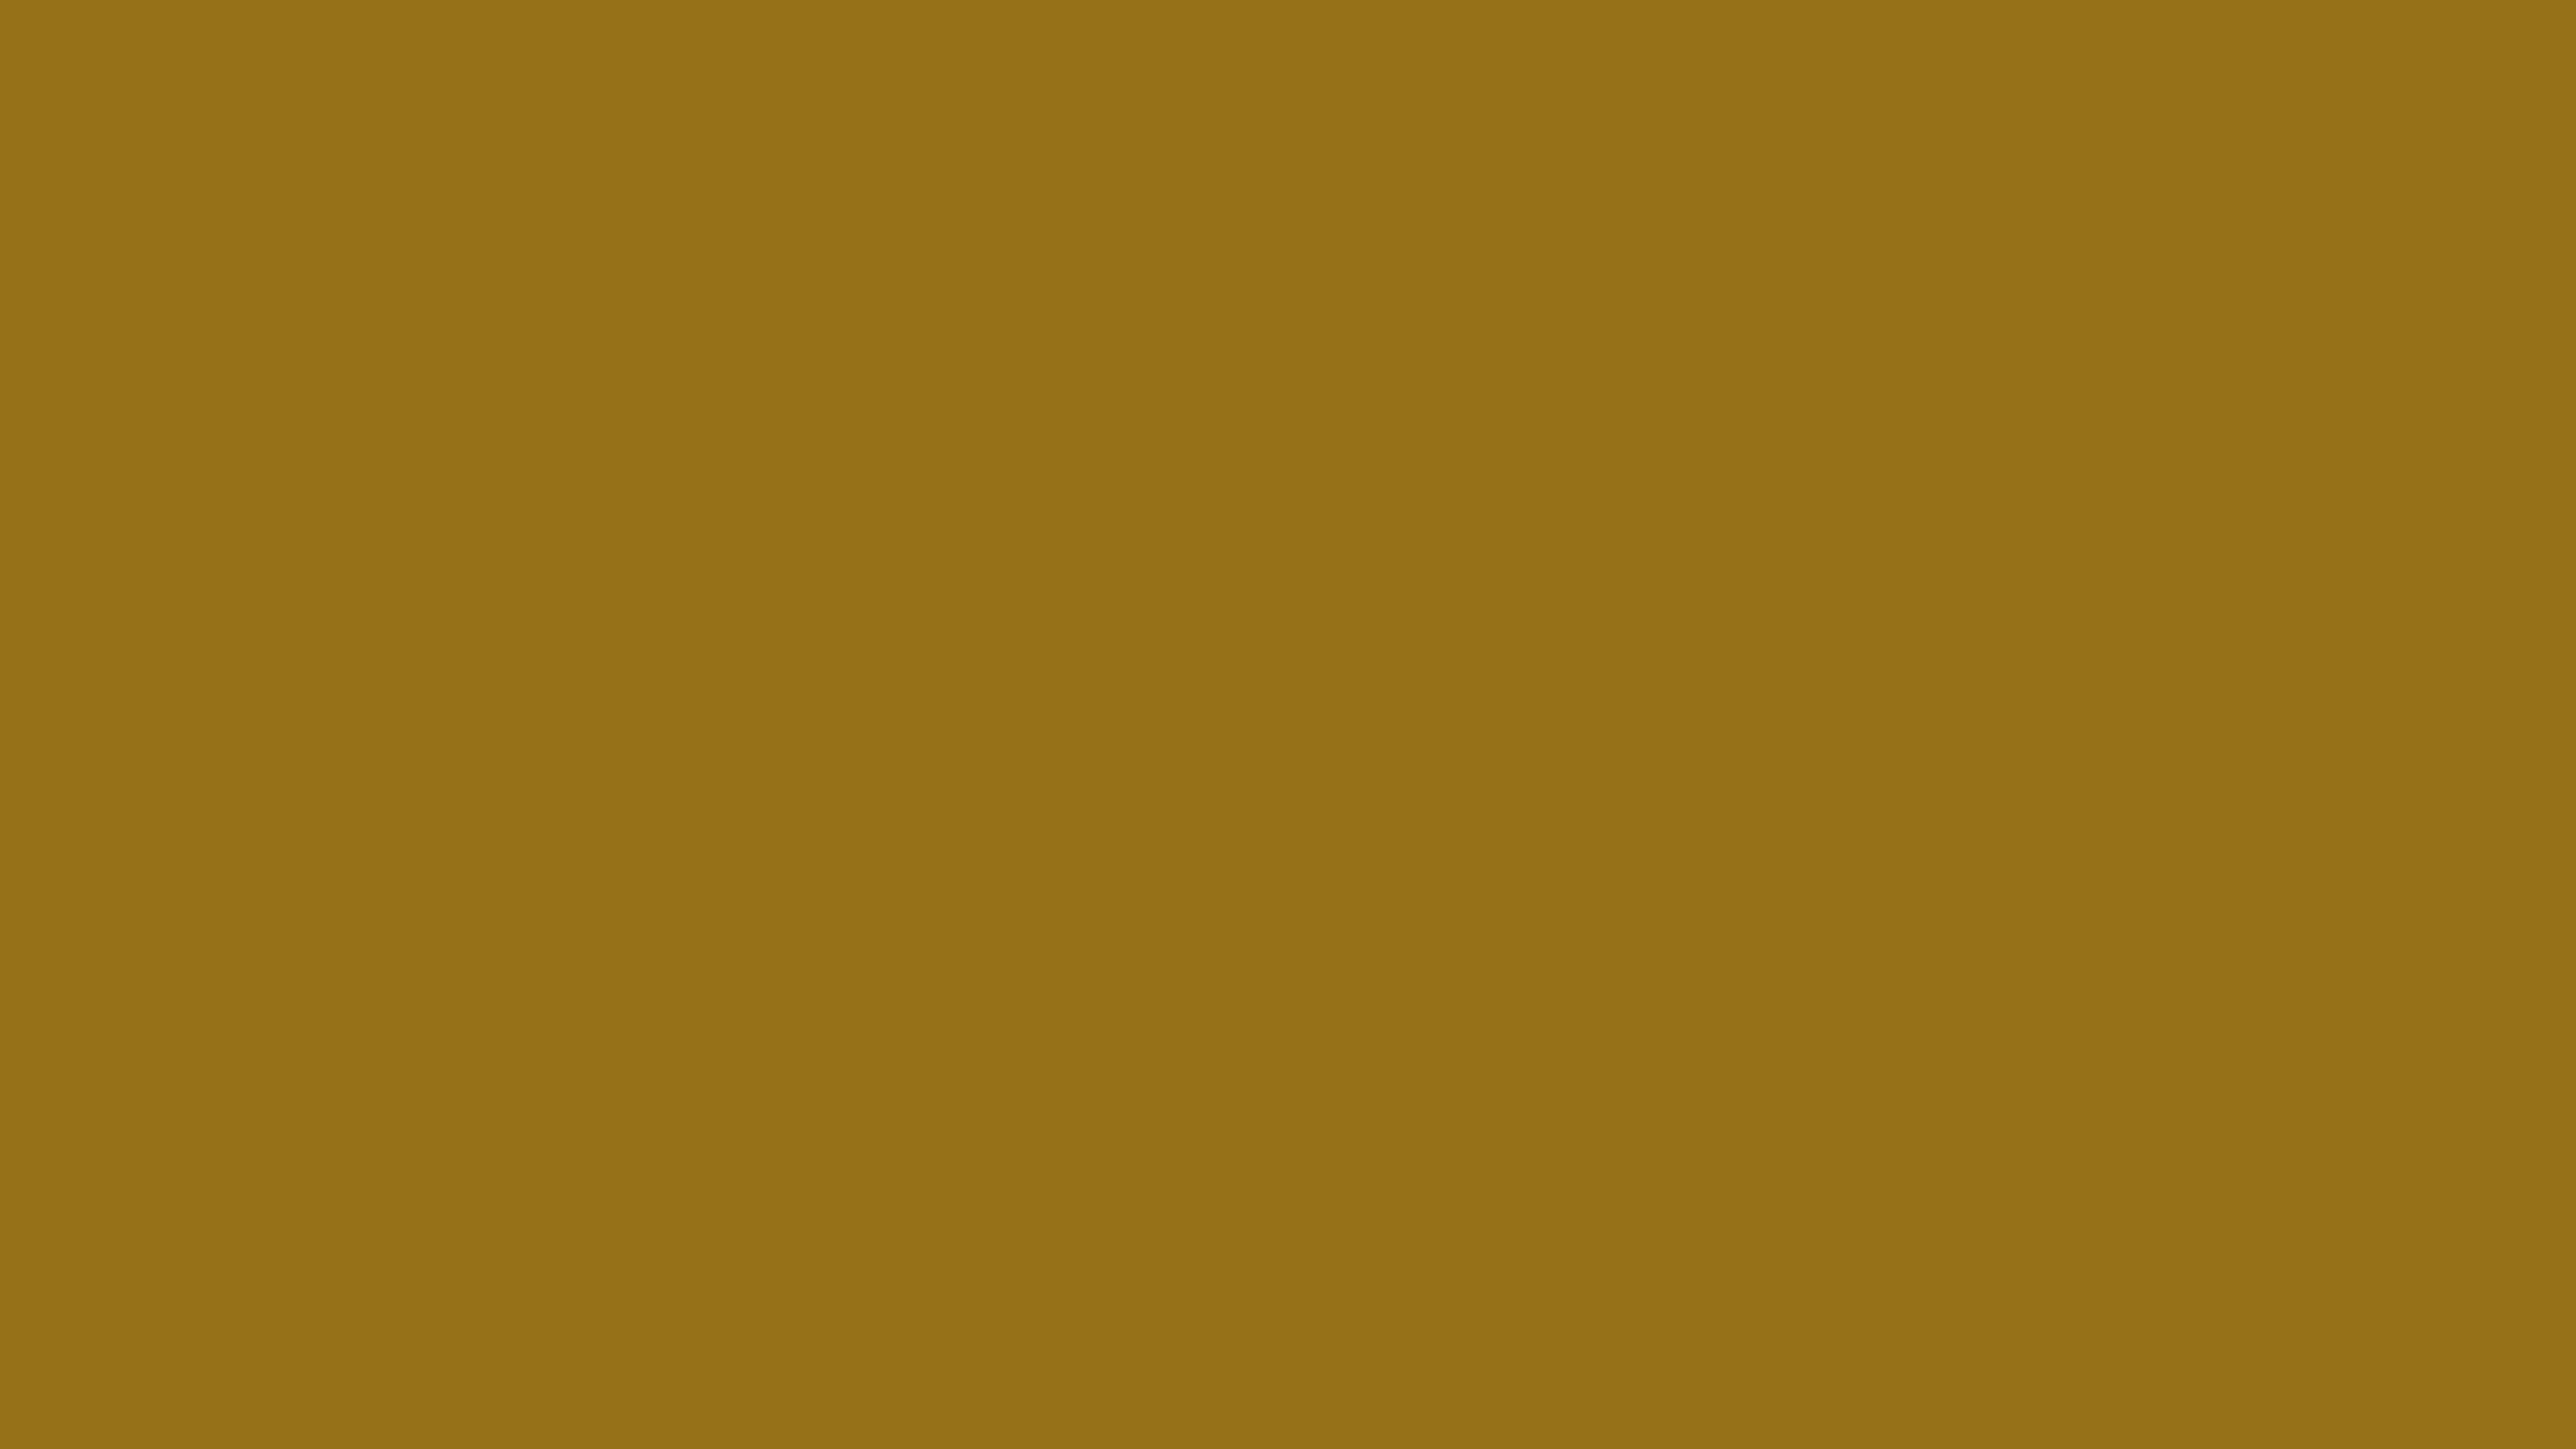 3840x2160 Bistre Brown Solid Color Background